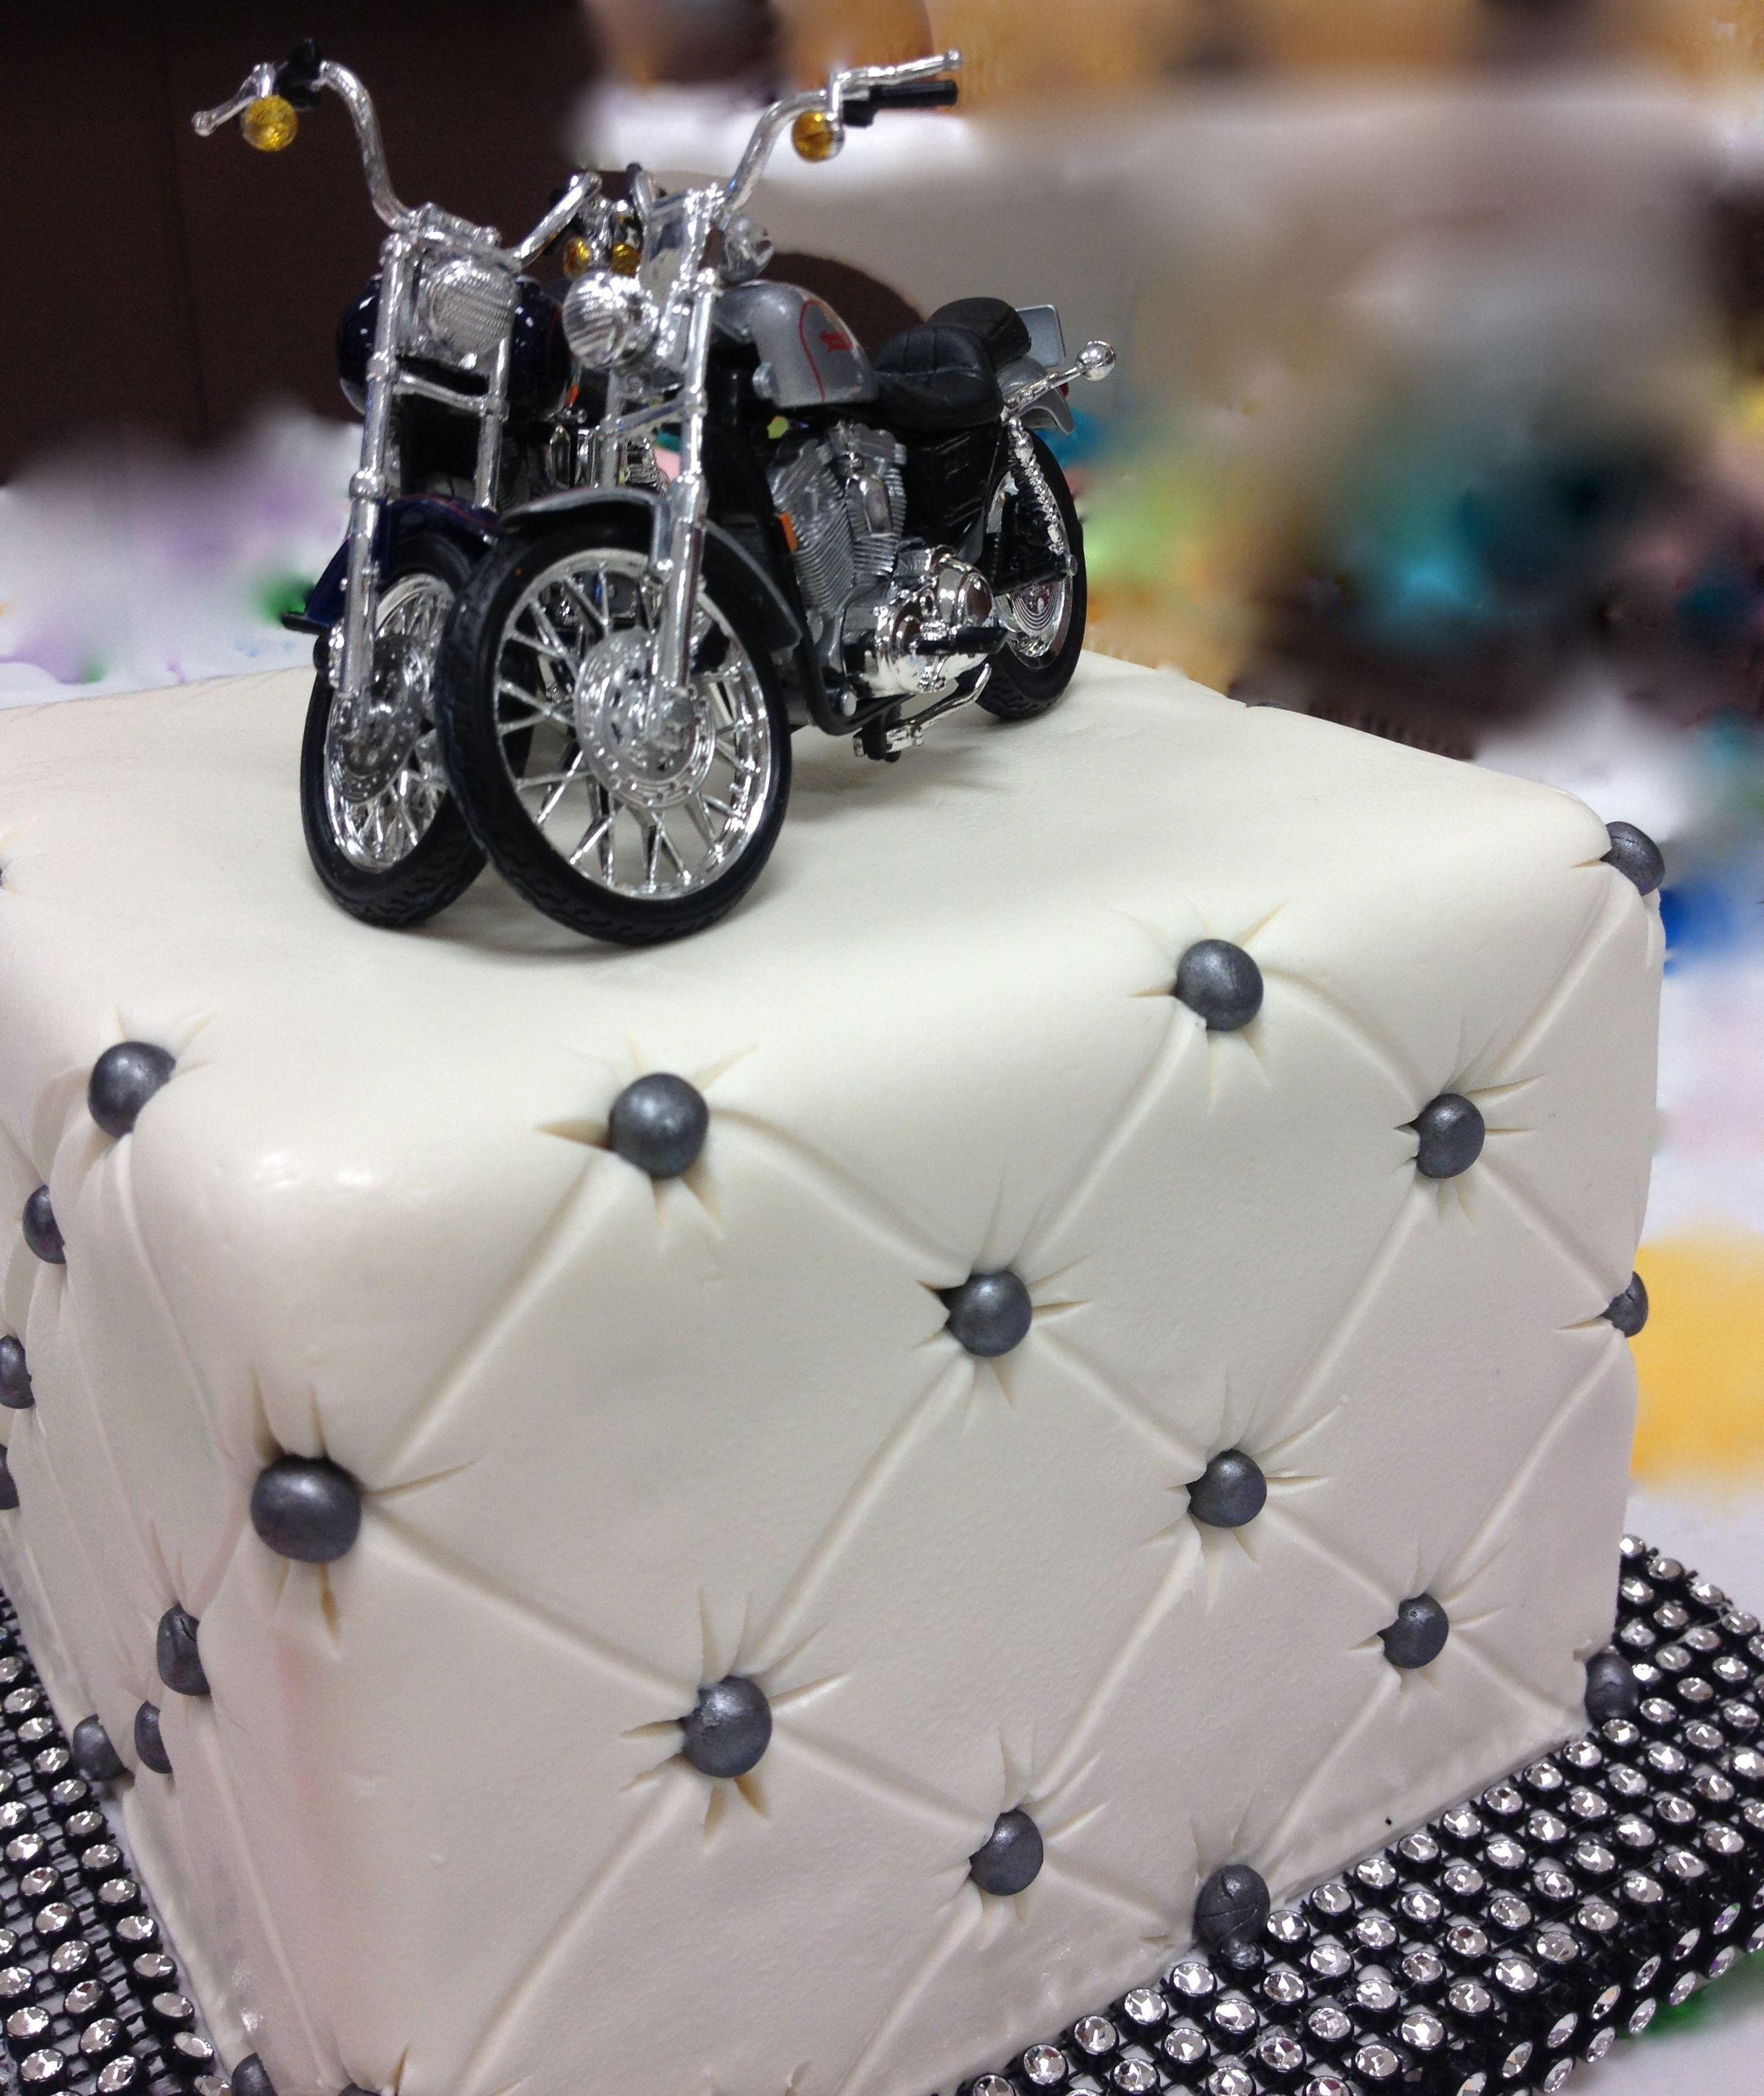 Harley Davidson Motorcycle Cake Toppers Harleydavidson Wedding